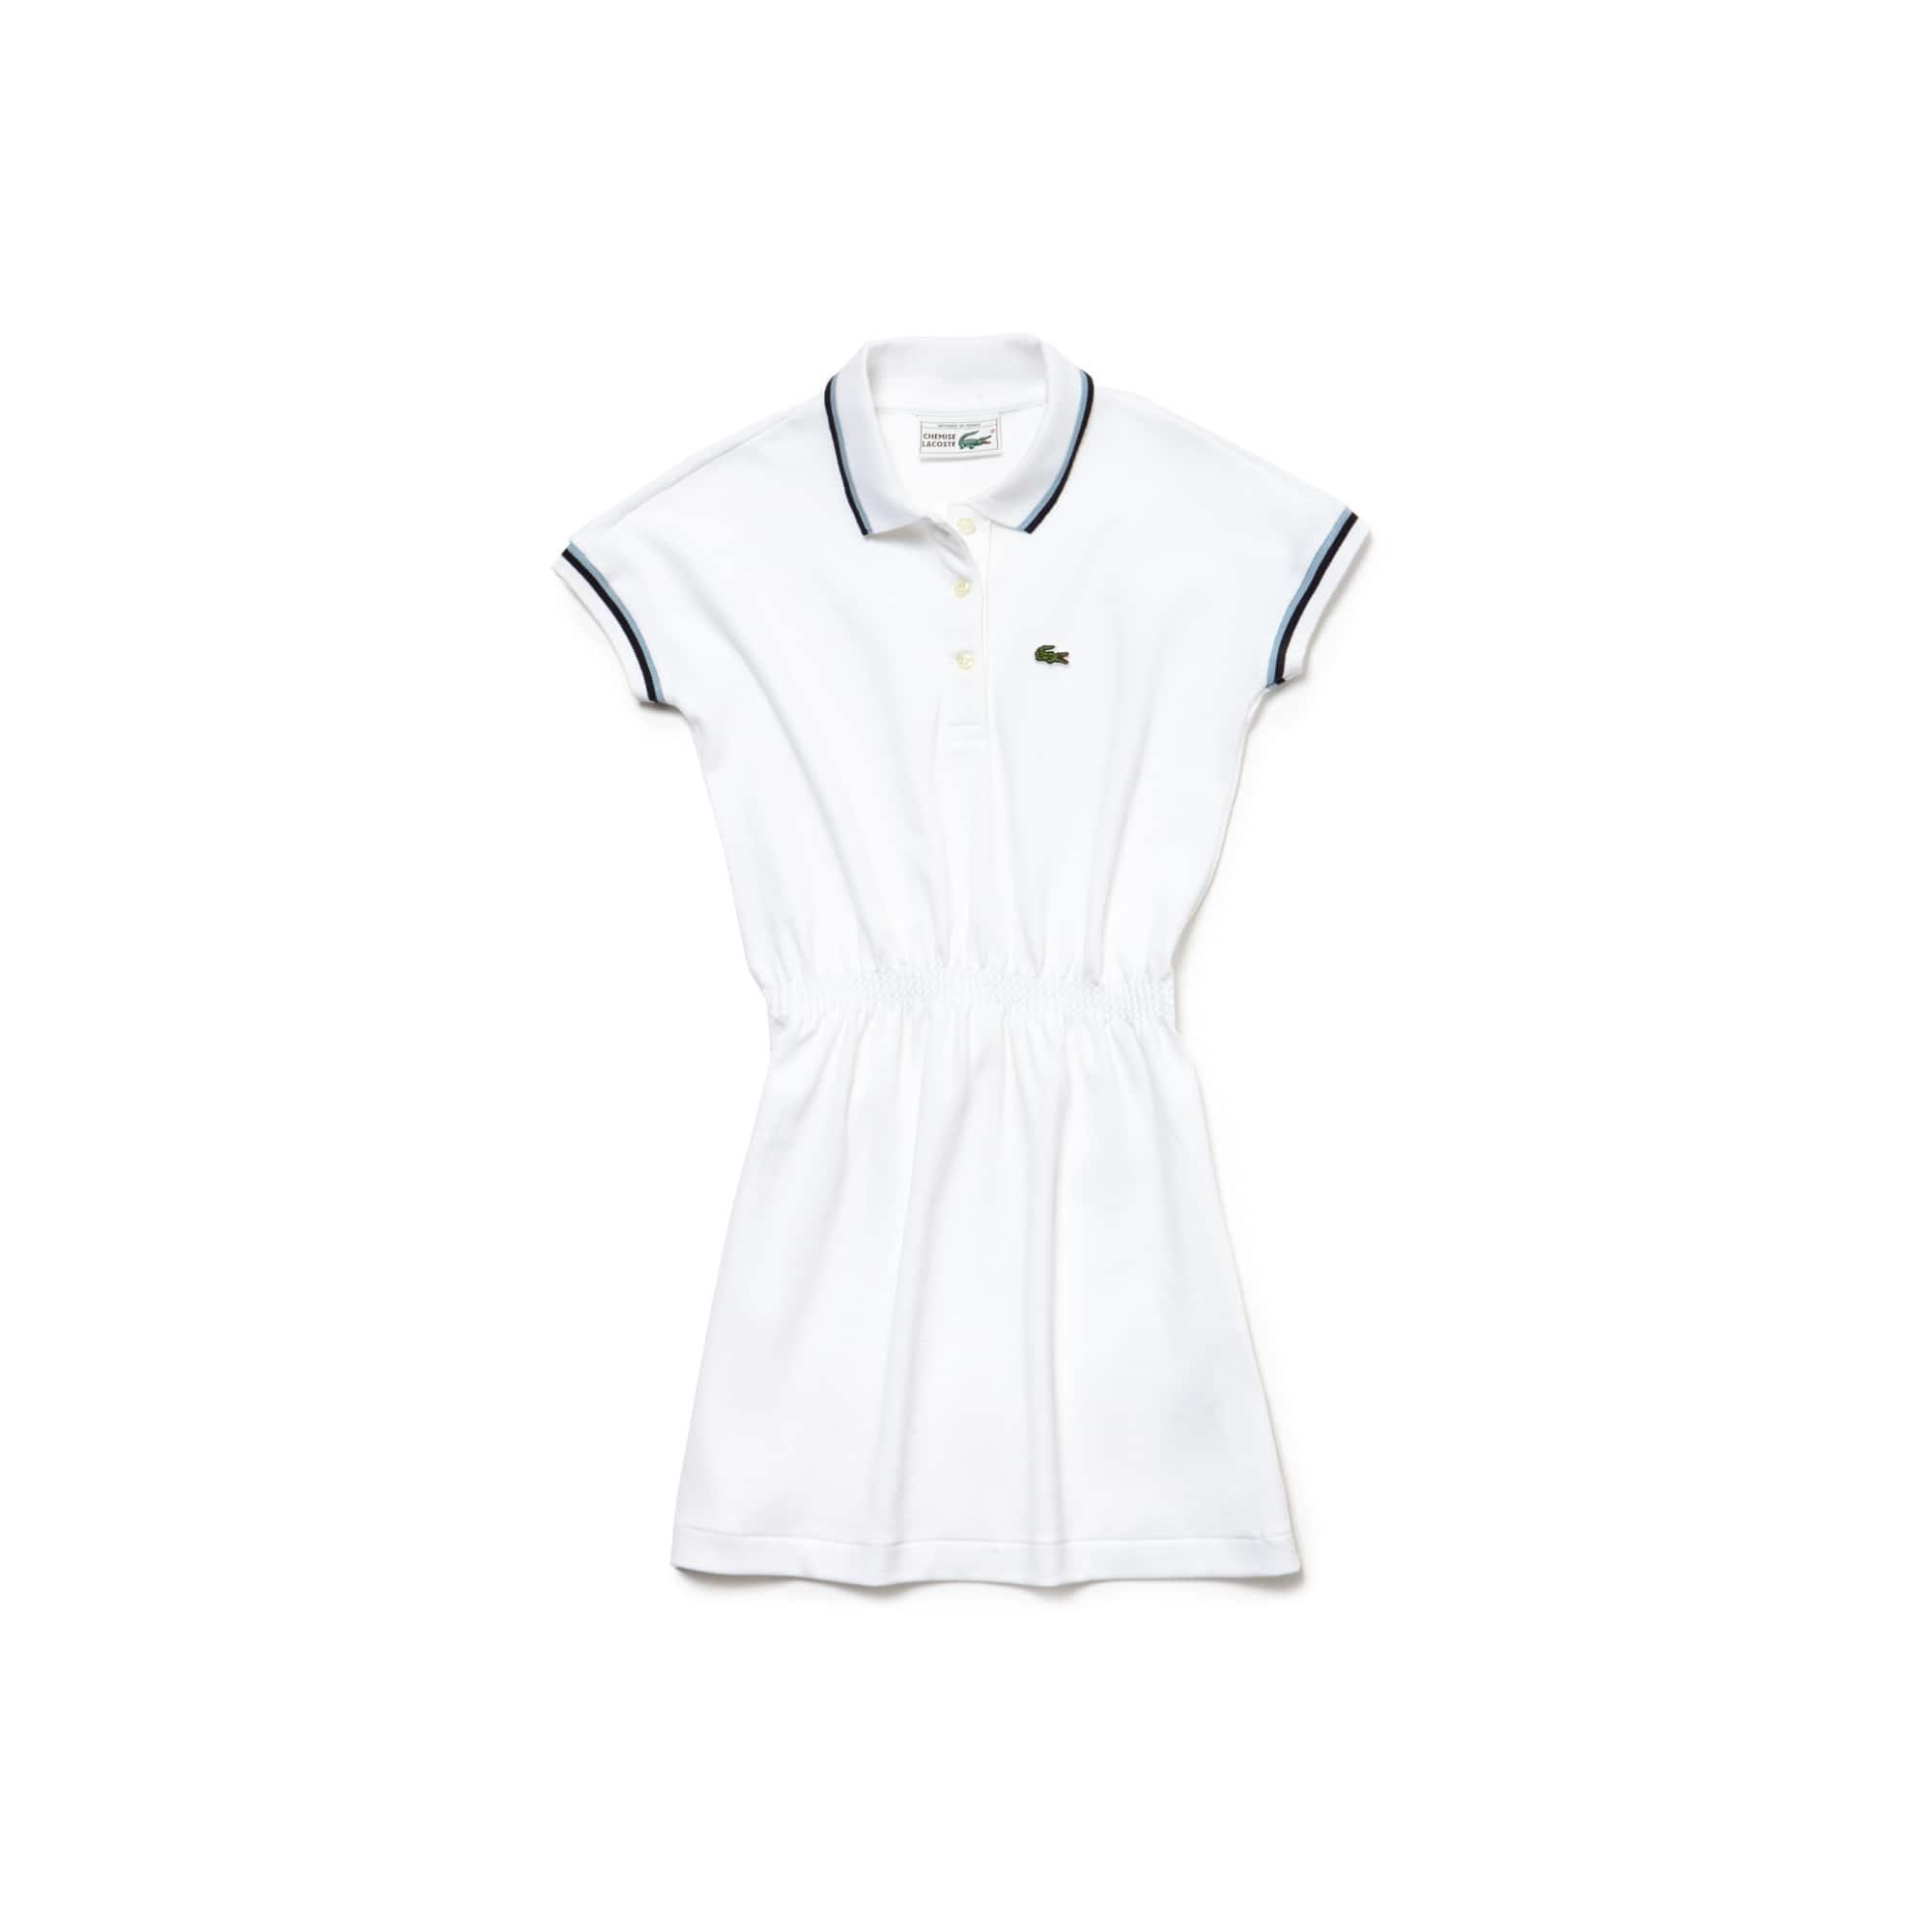 Vestido polo Niña Lacoste de piqué elástico Edición limitada Aniversario 85 años